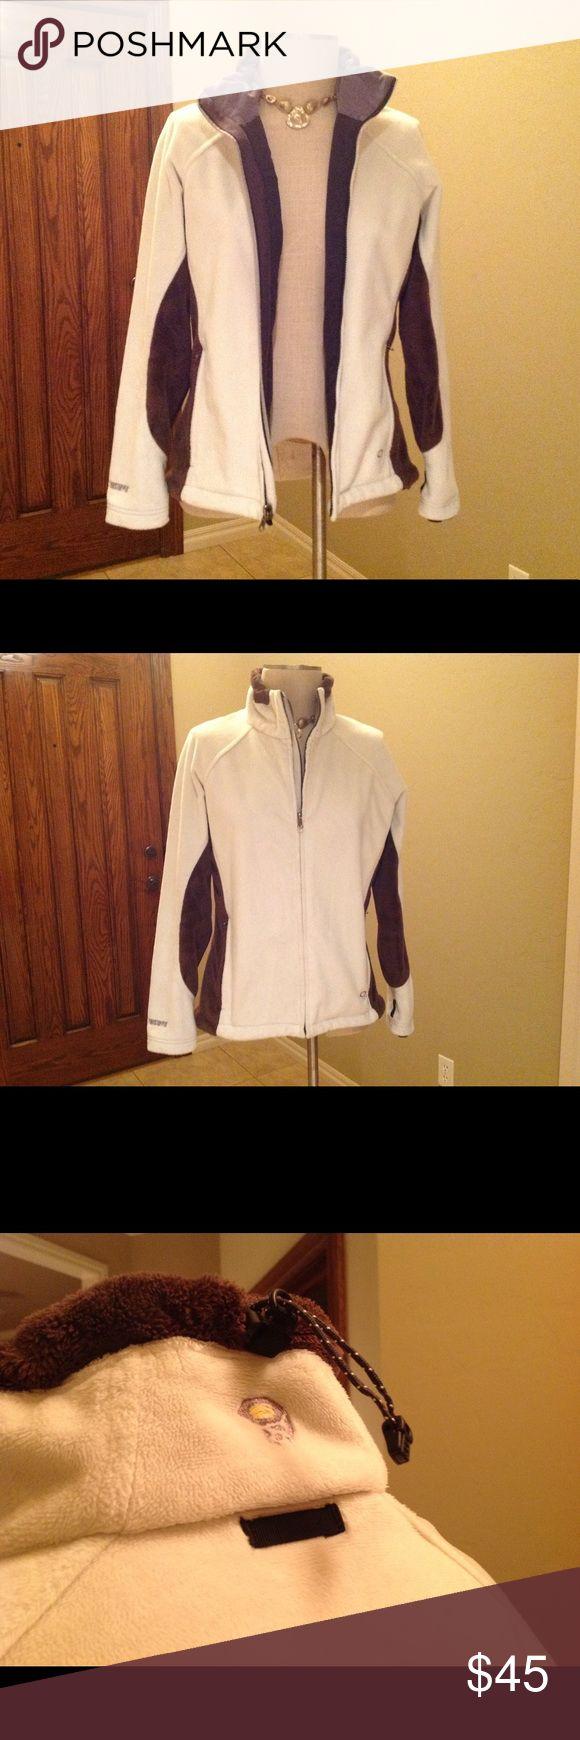 Mountain HardWear Jacket EUC. Thick and super soft and very warm! Mountain Hardwear Jackets & Coats